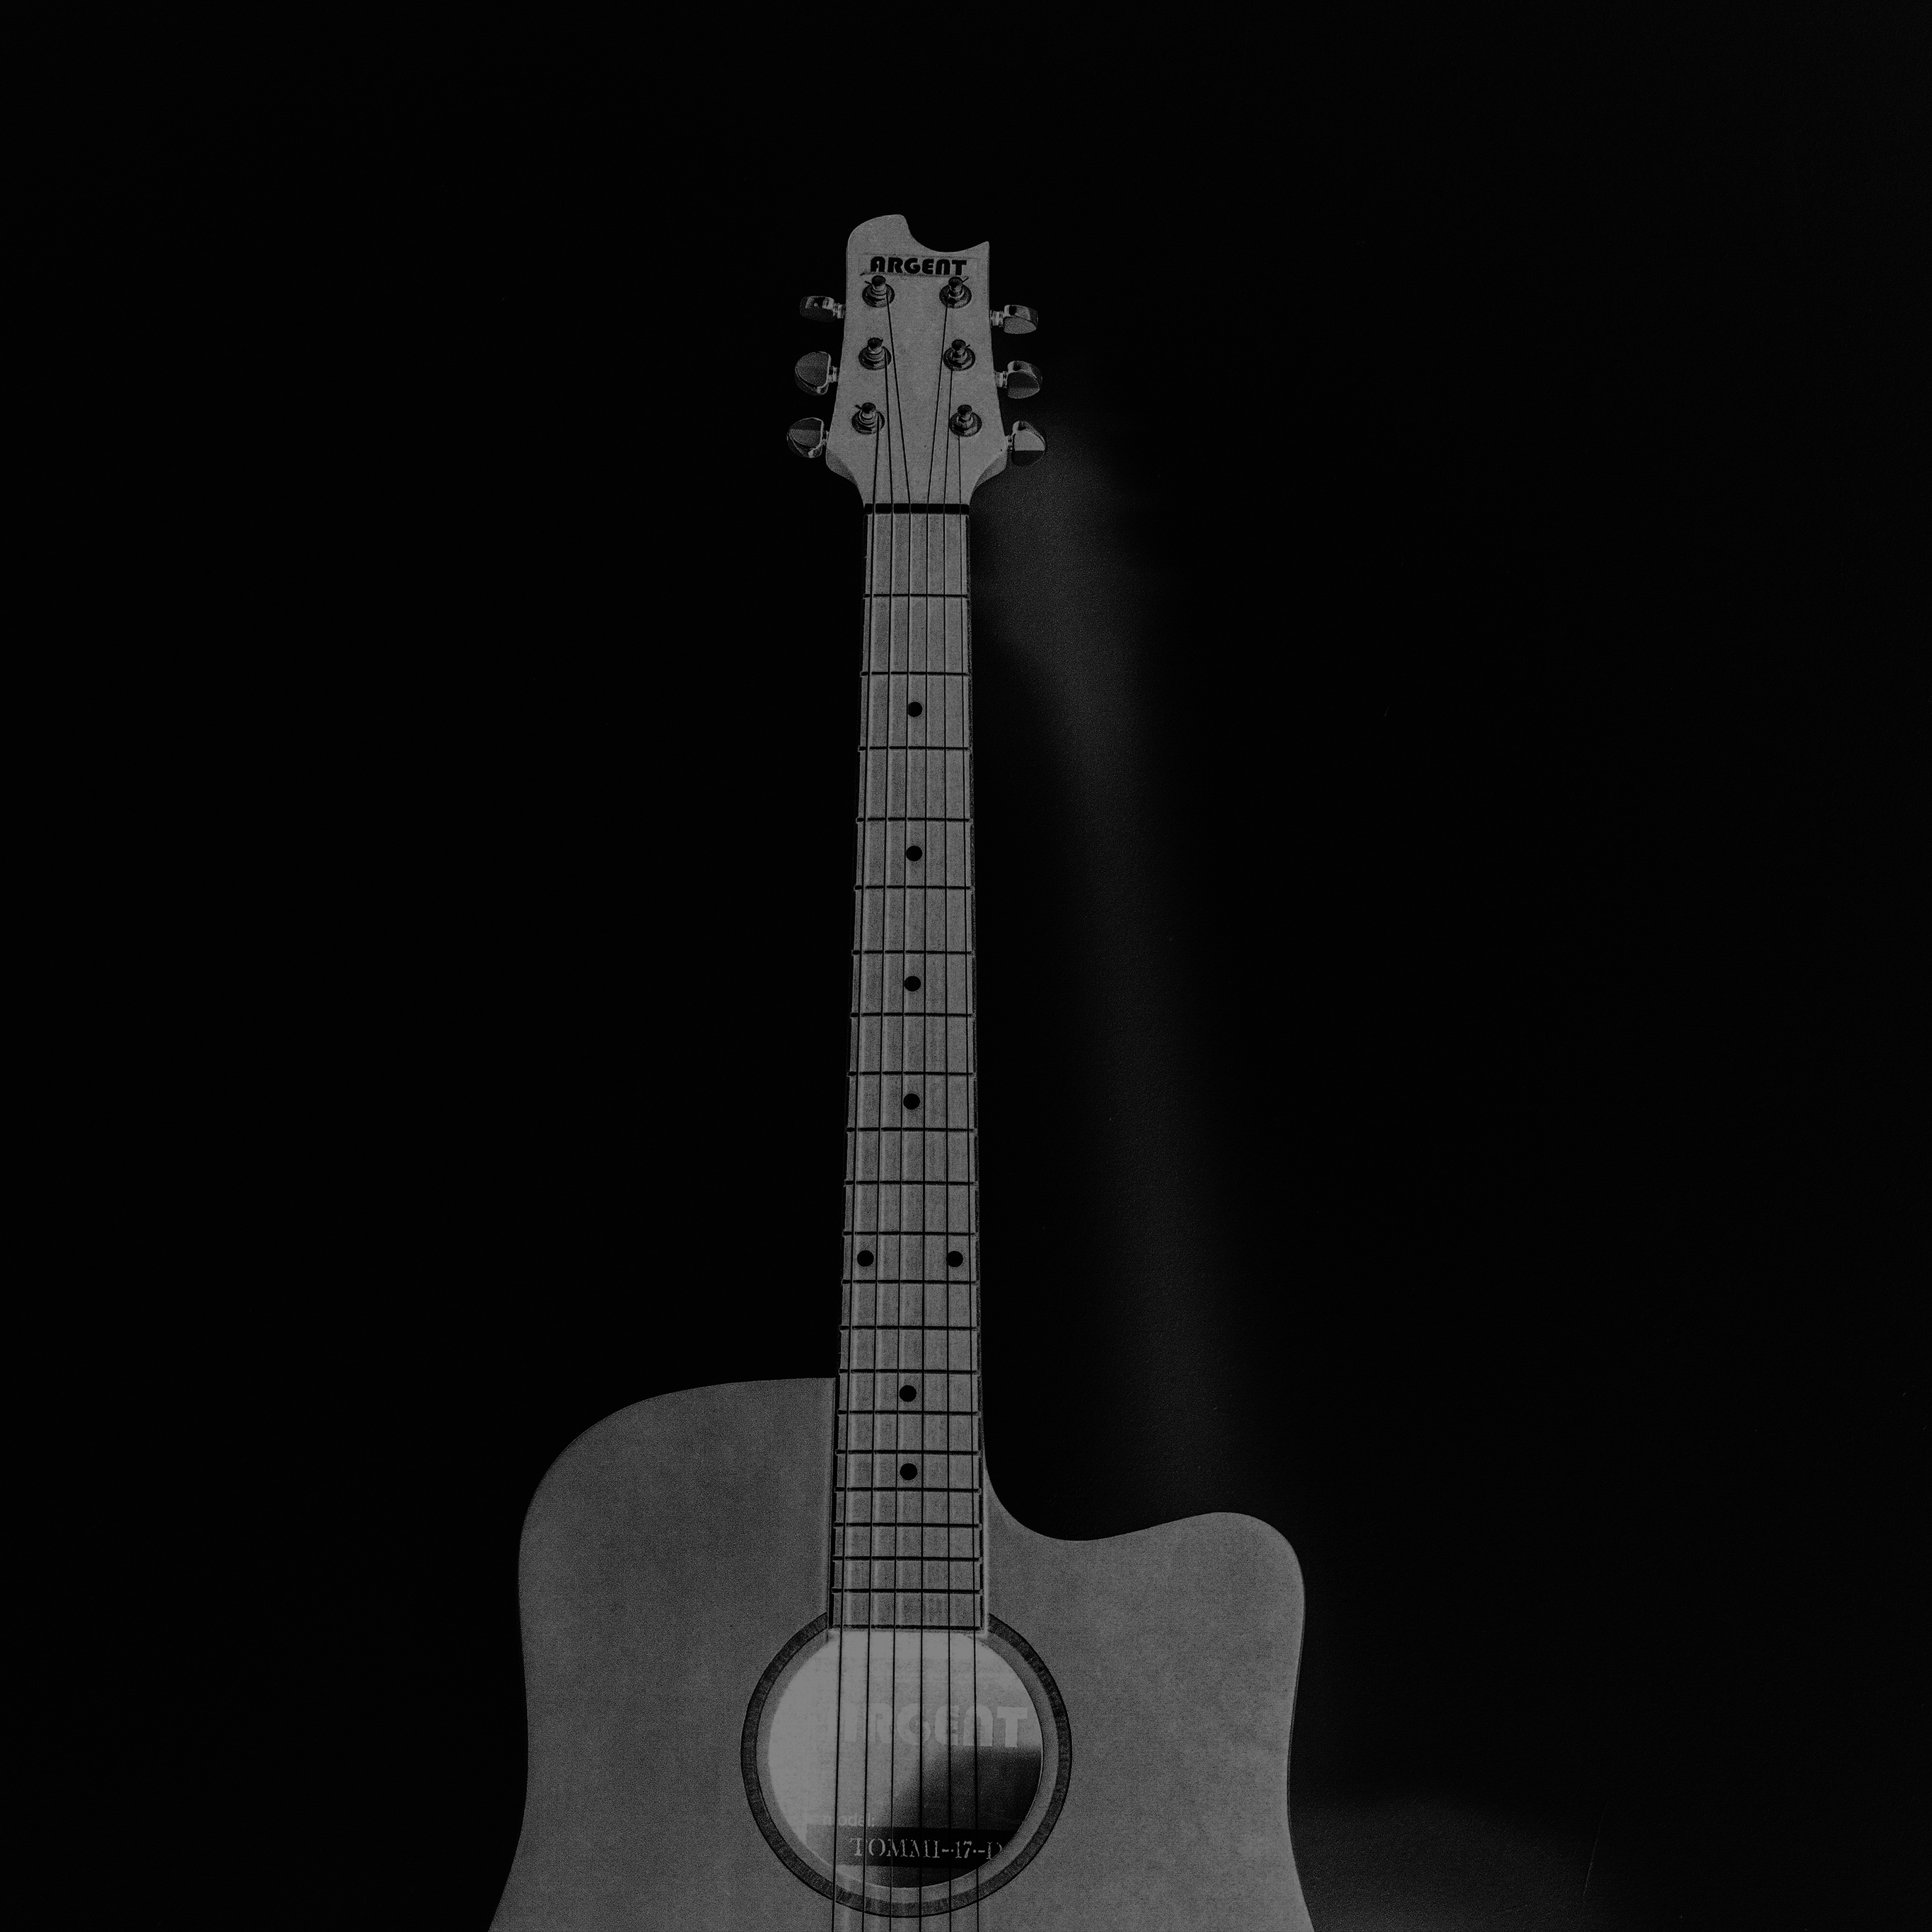 Mw80 Guitar Art Bw Dark Music Song Black Wallpaper